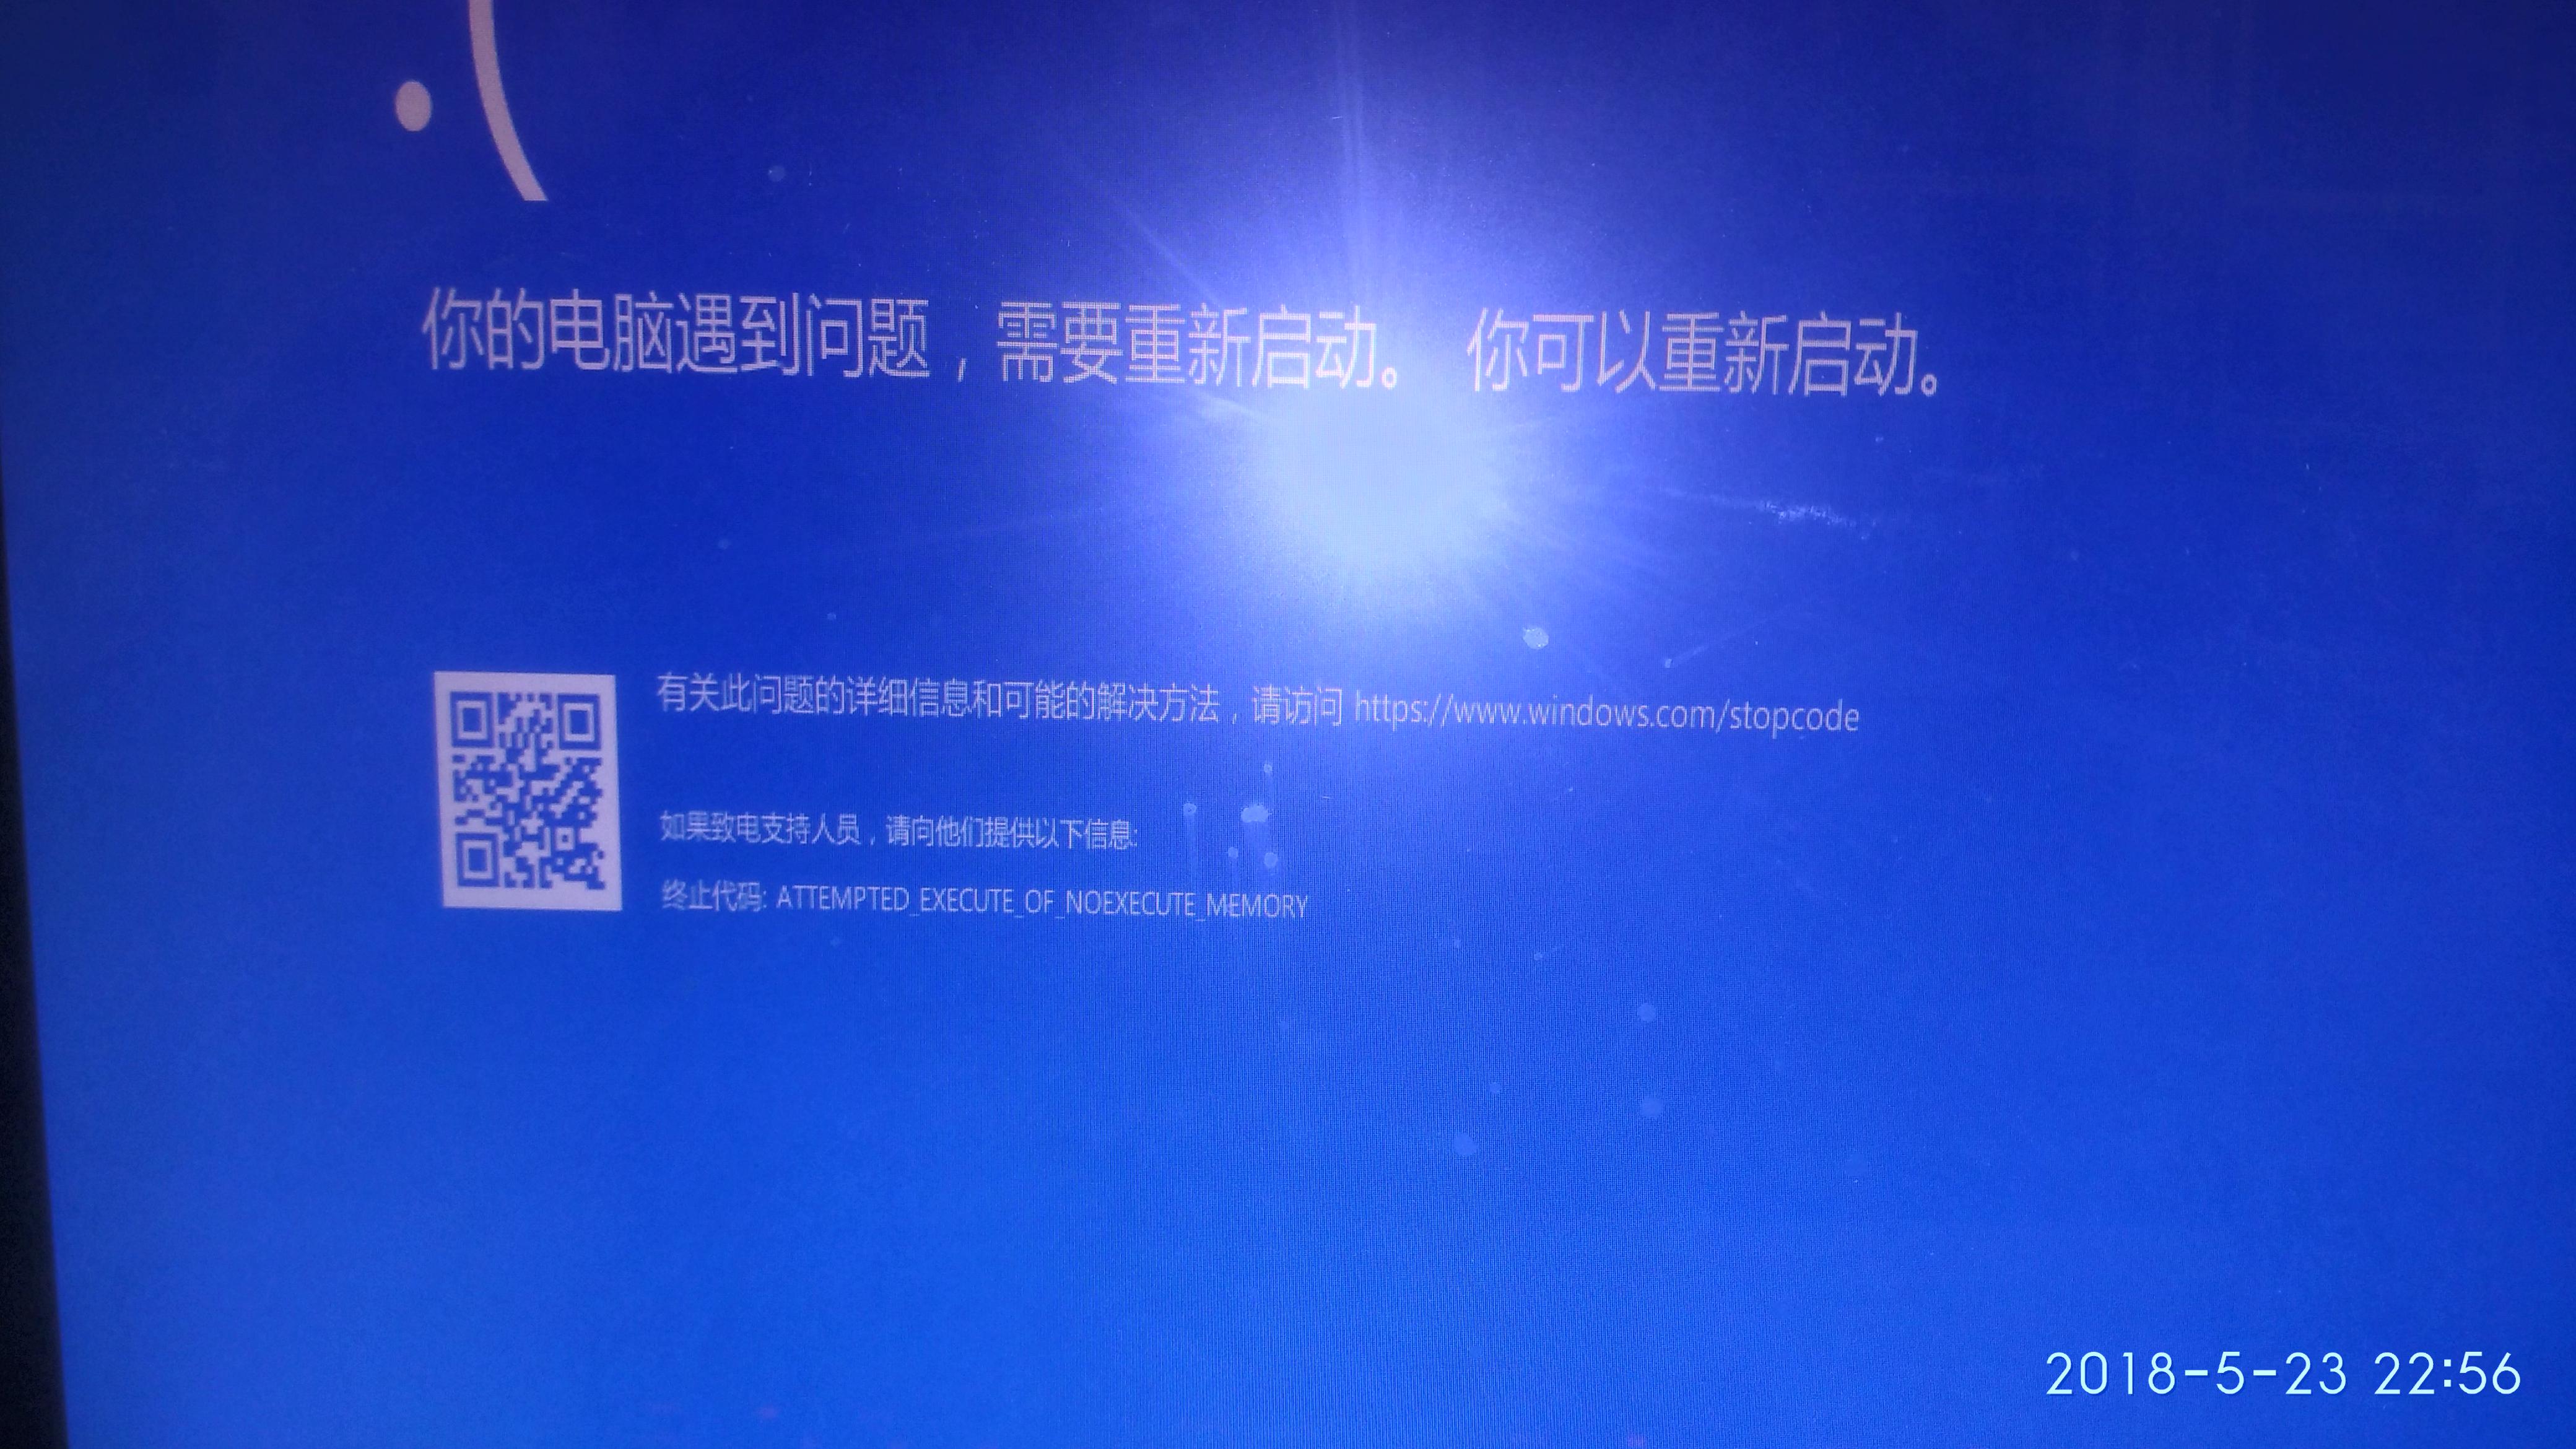 qq桌球游戏_电脑在安装腾讯的QQ游戏里的腾讯桌球会蓝屏 - Microsoft Community